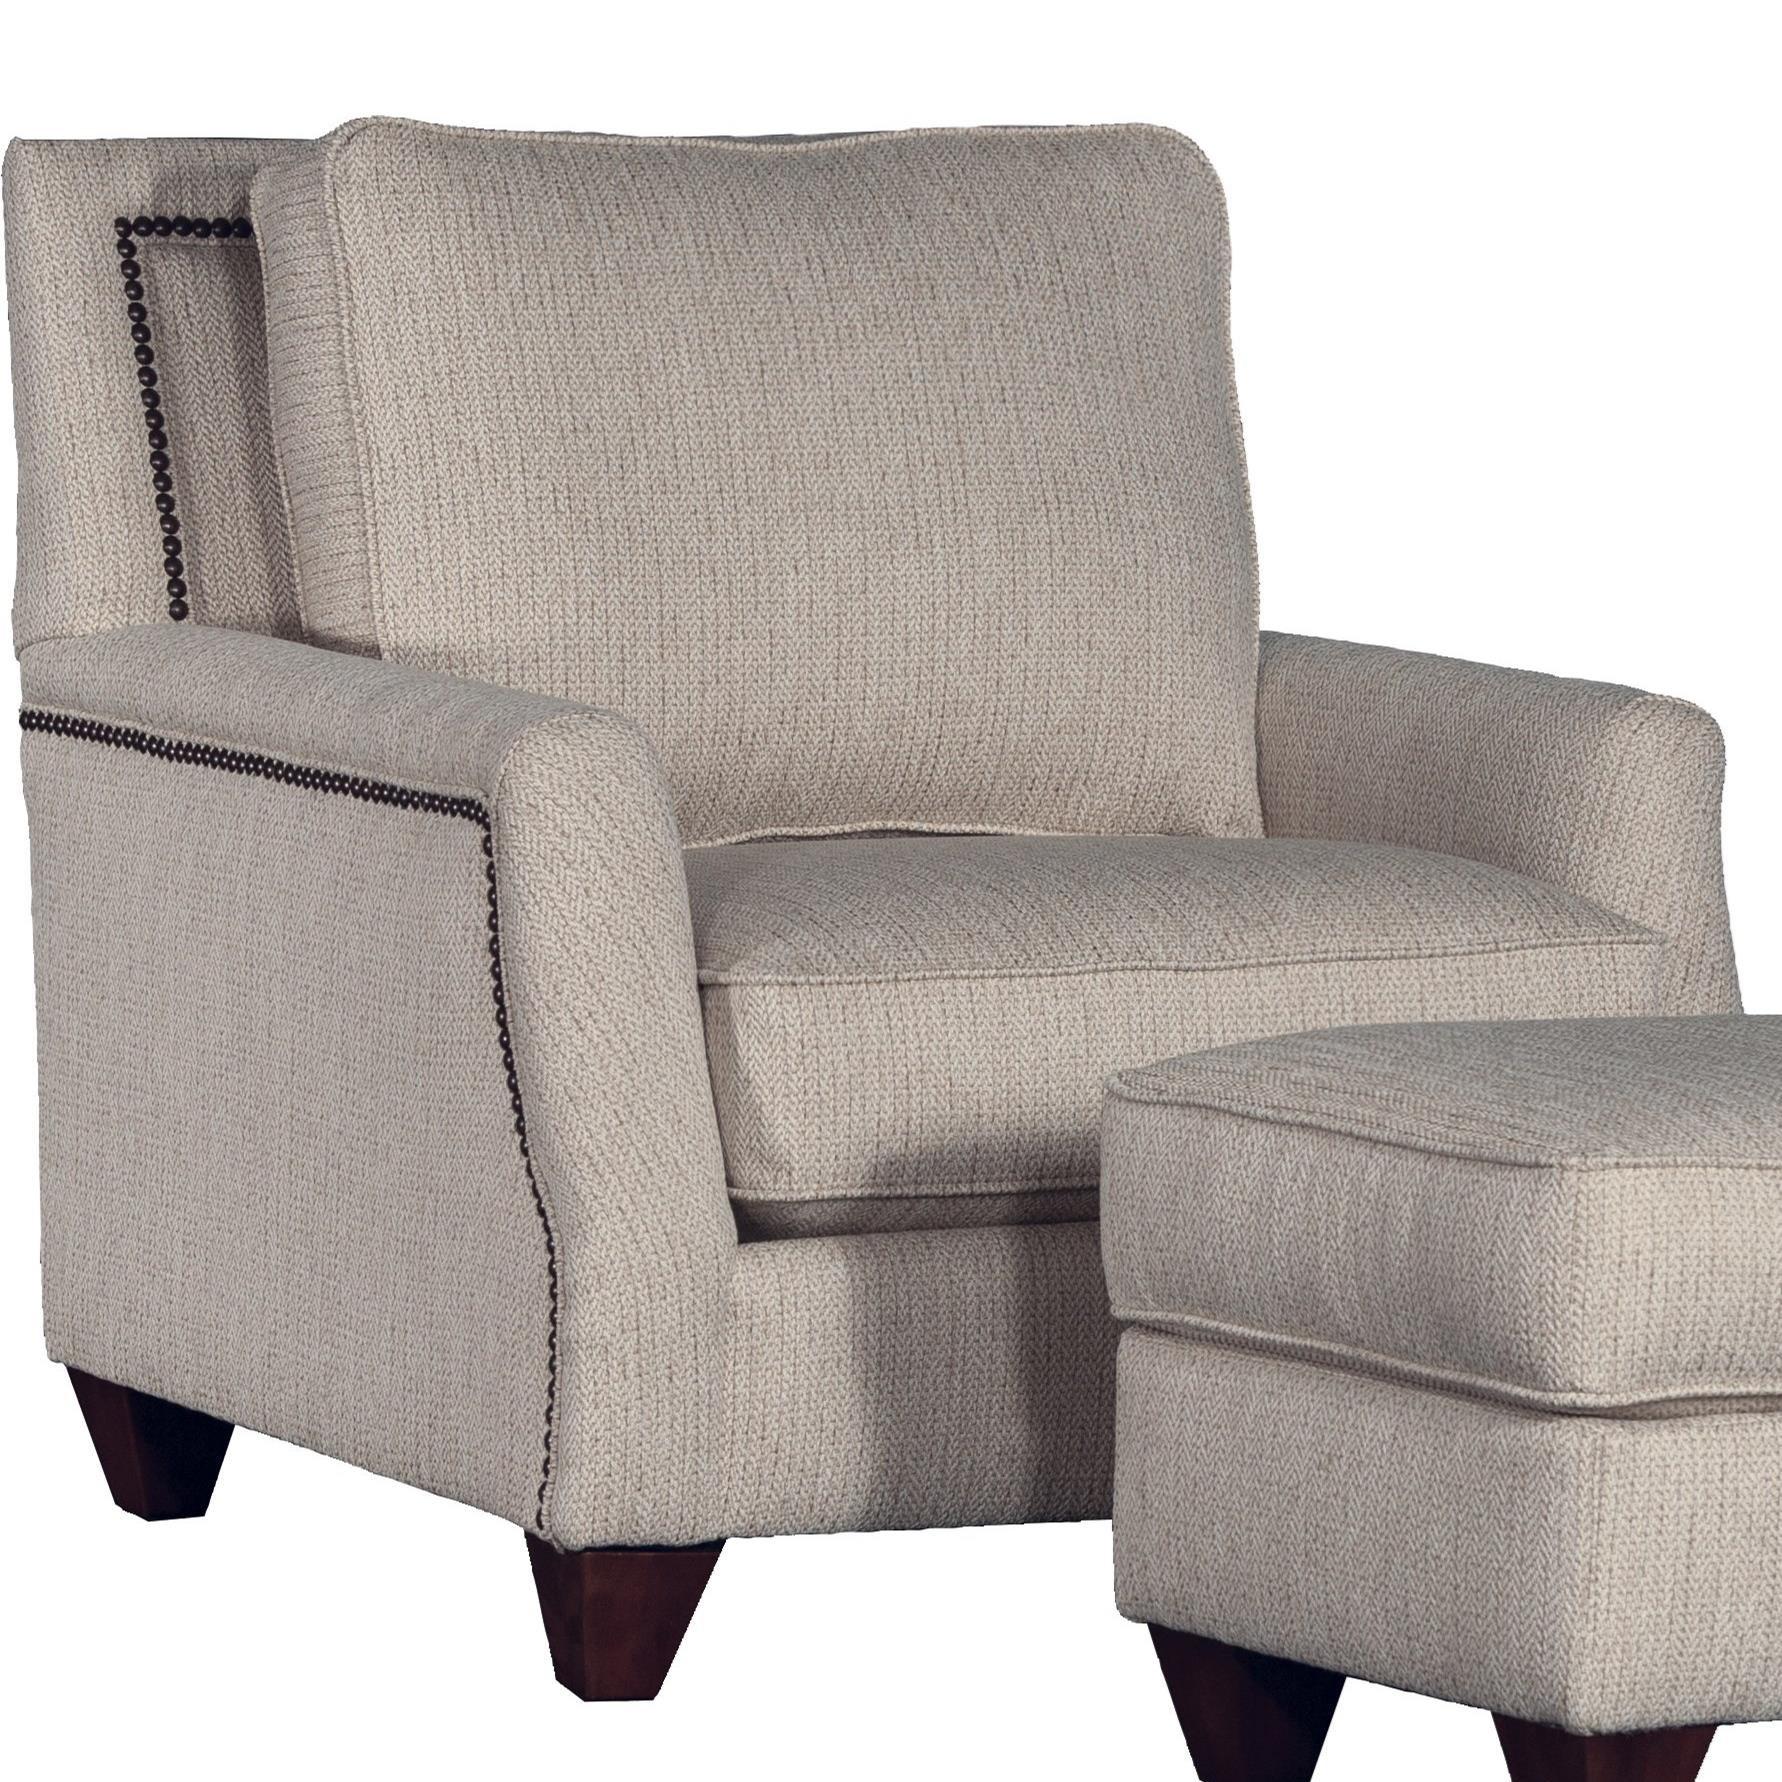 6200 Chair by Mayo at Pedigo Furniture